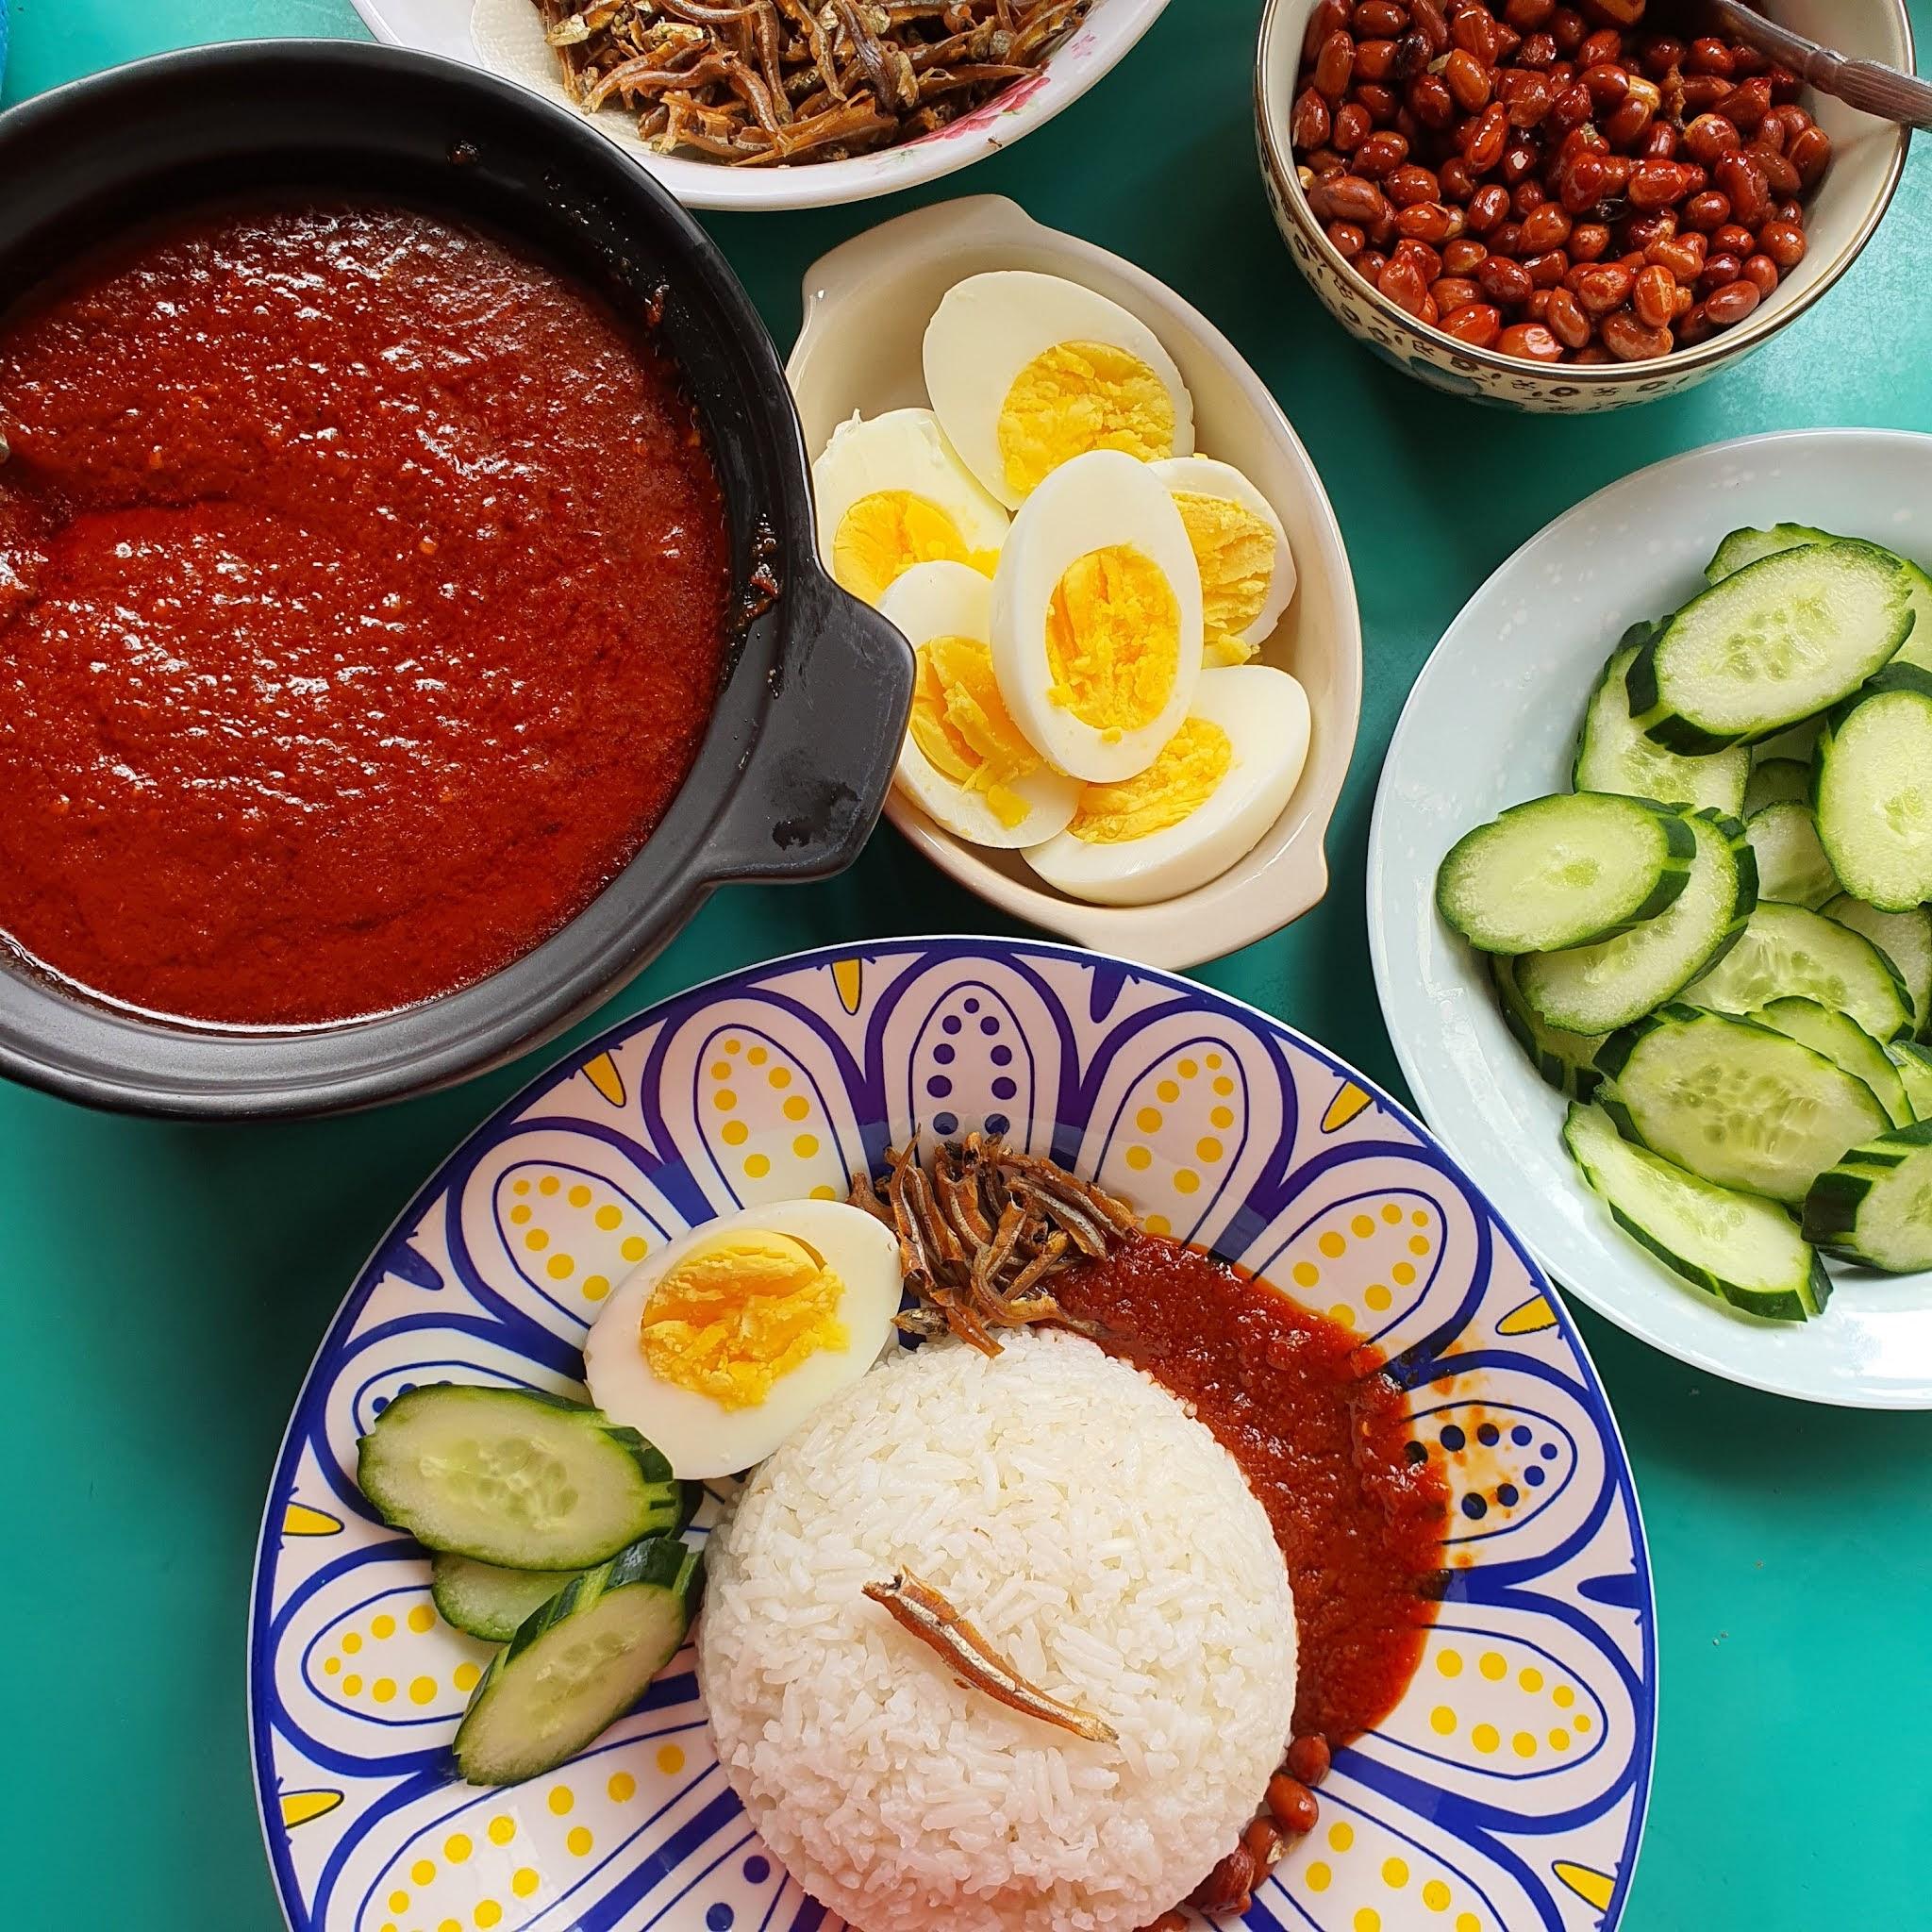 easy nasi lemak recipe, nasi lemak recipe, resipi mudah nasi lemak, resipi senang masak nasi lemak, resipi nasi lemak berniaga, business nasi lemak,